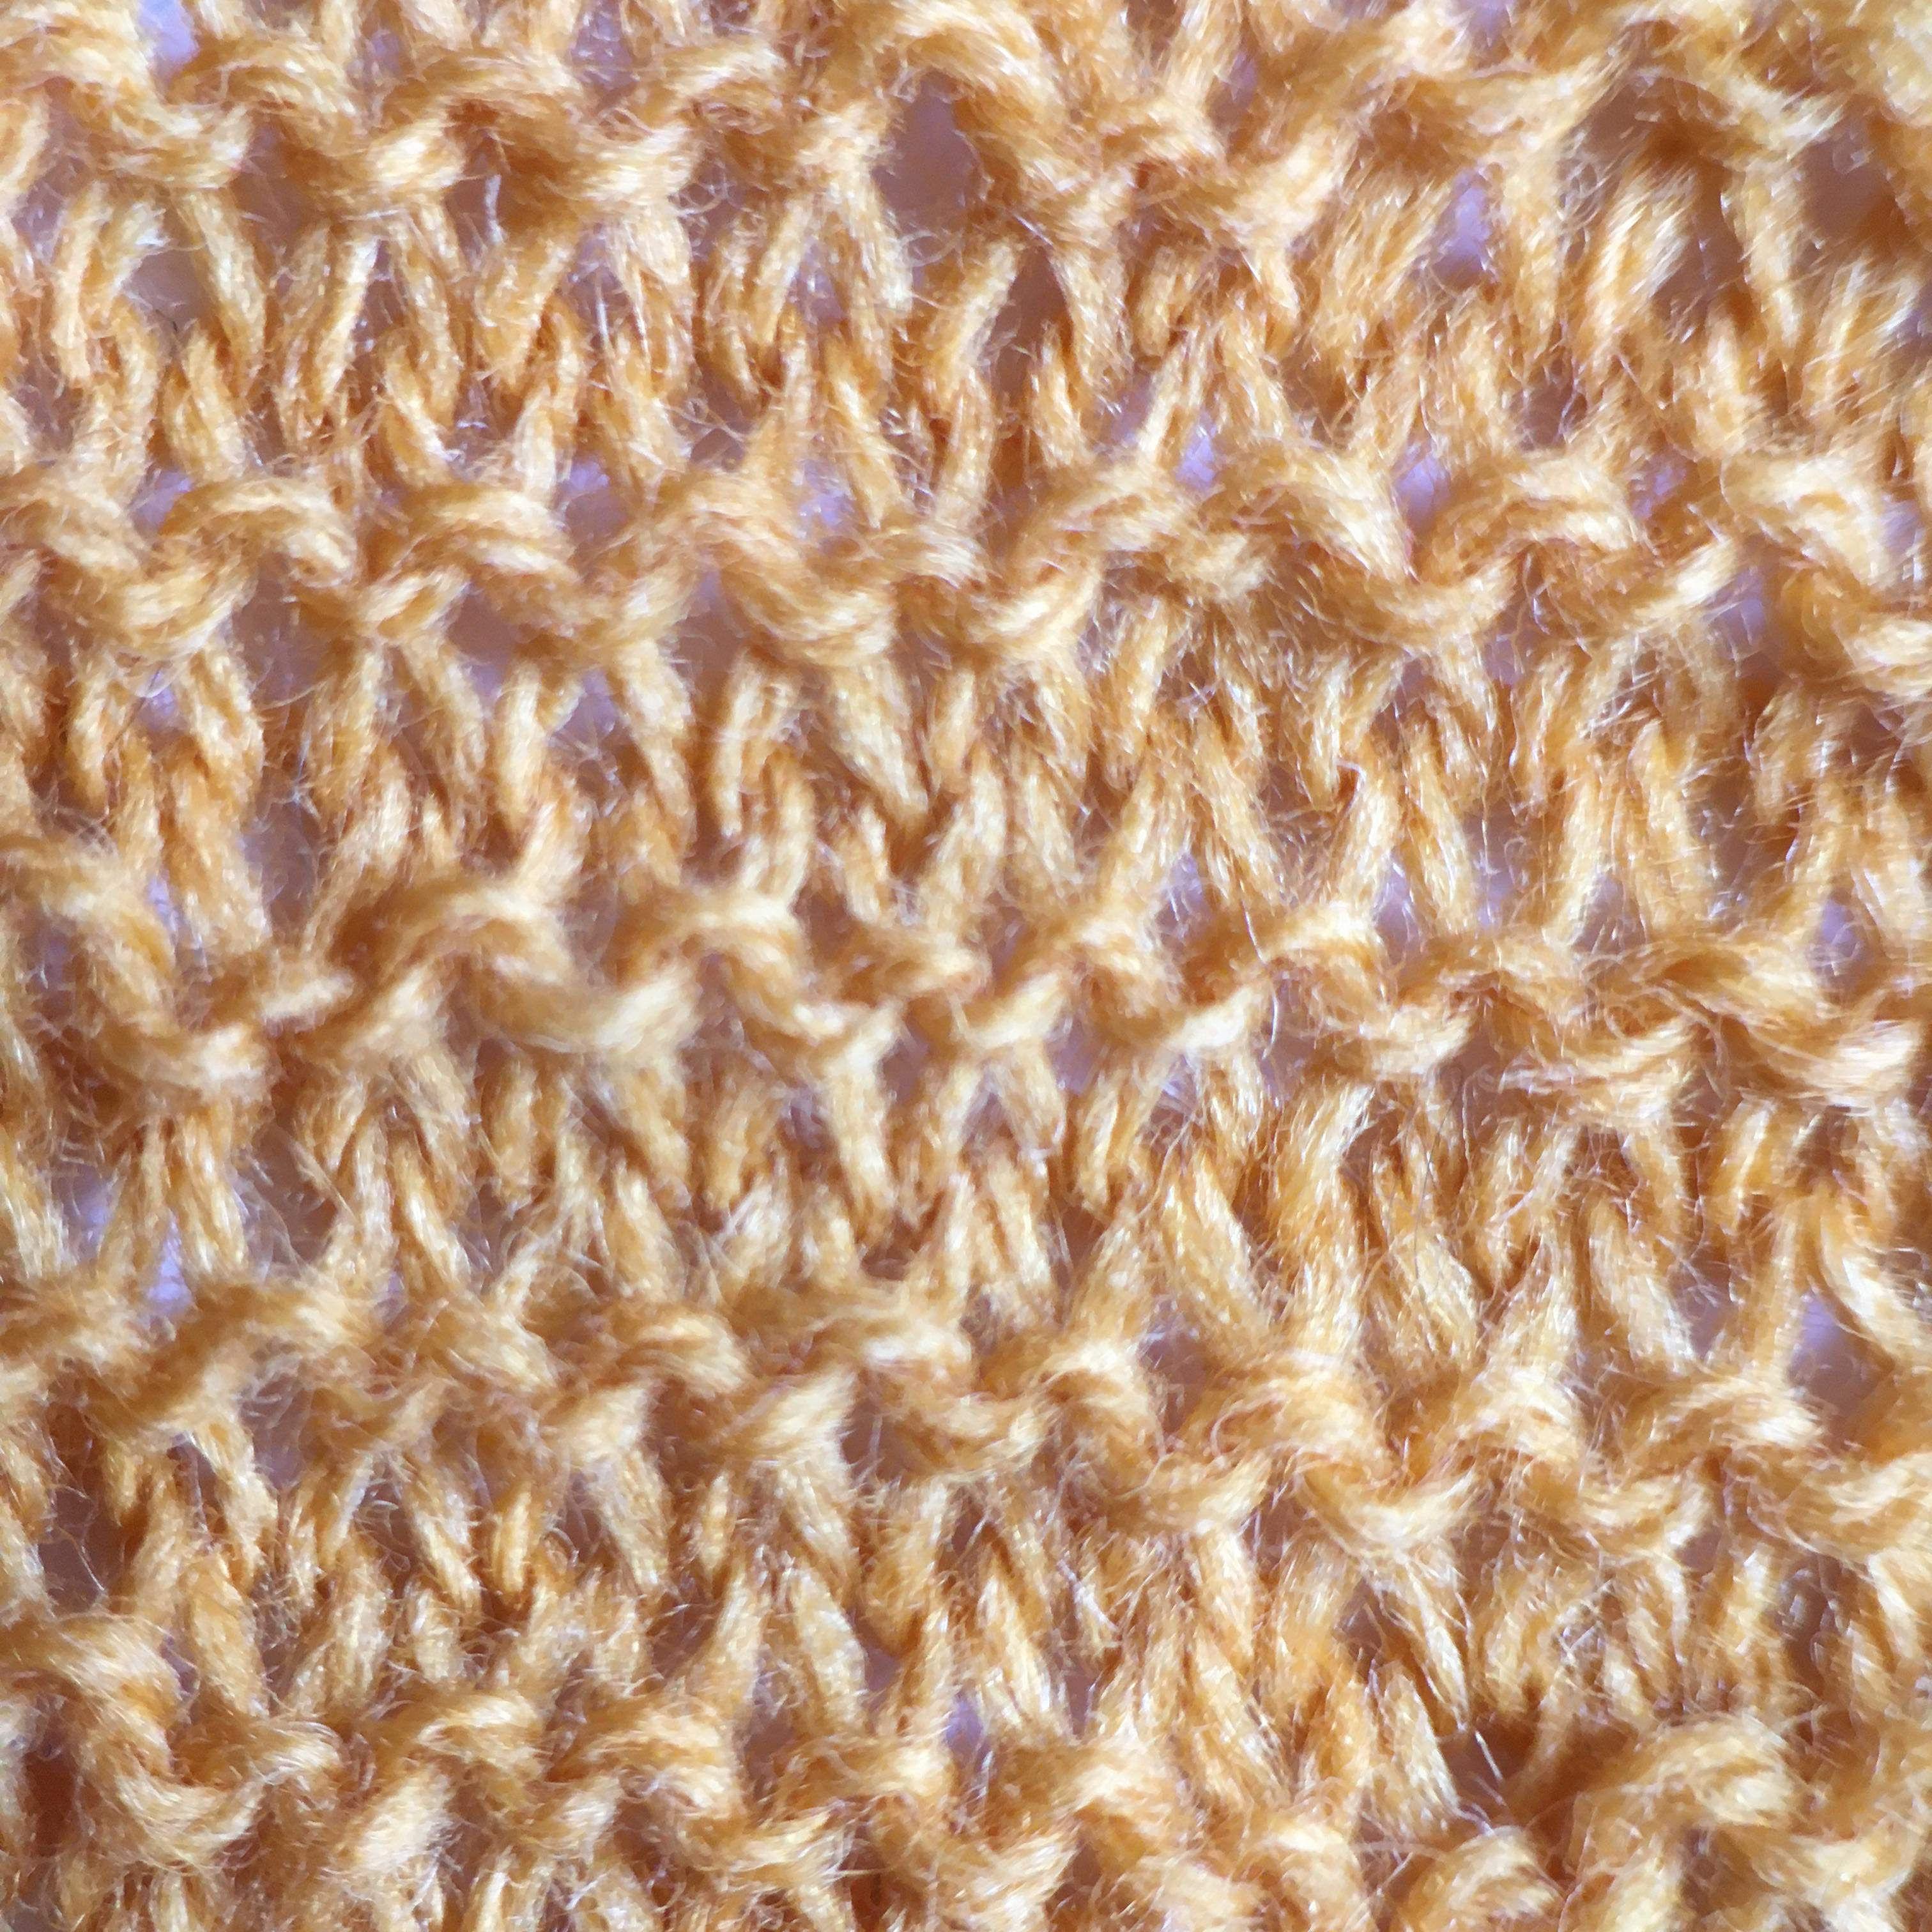 Stretched garter stitch